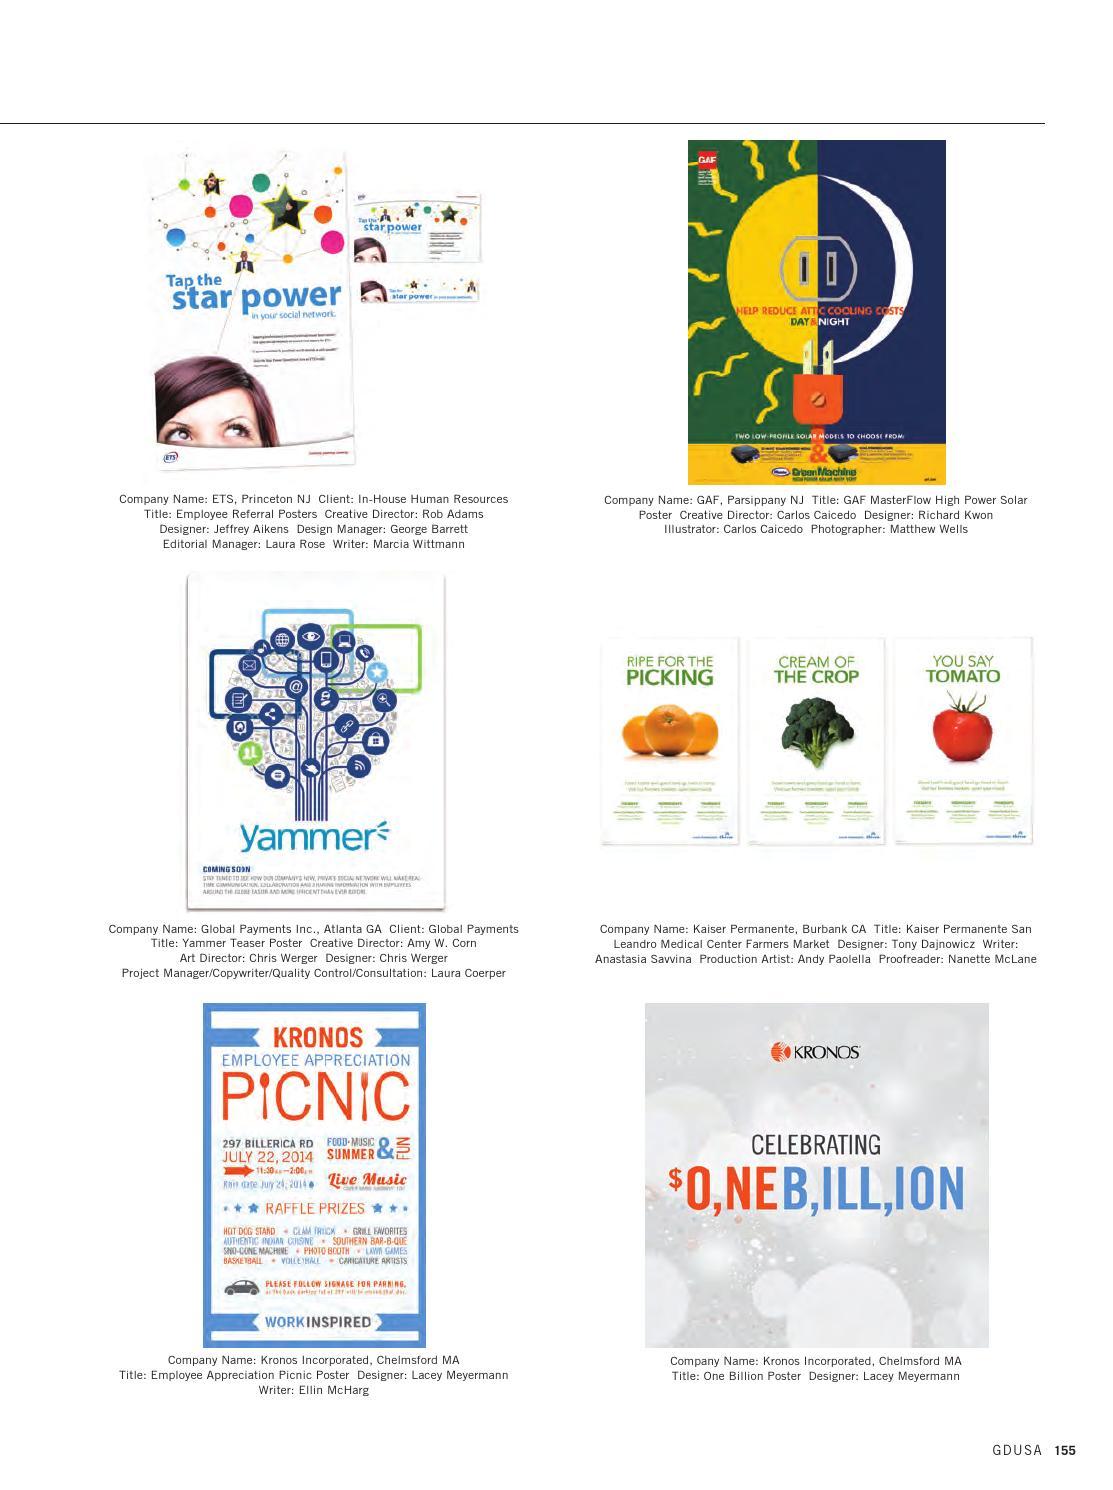 GDUSA Magazine July/August 2015 by Graphic Design USA - issuu